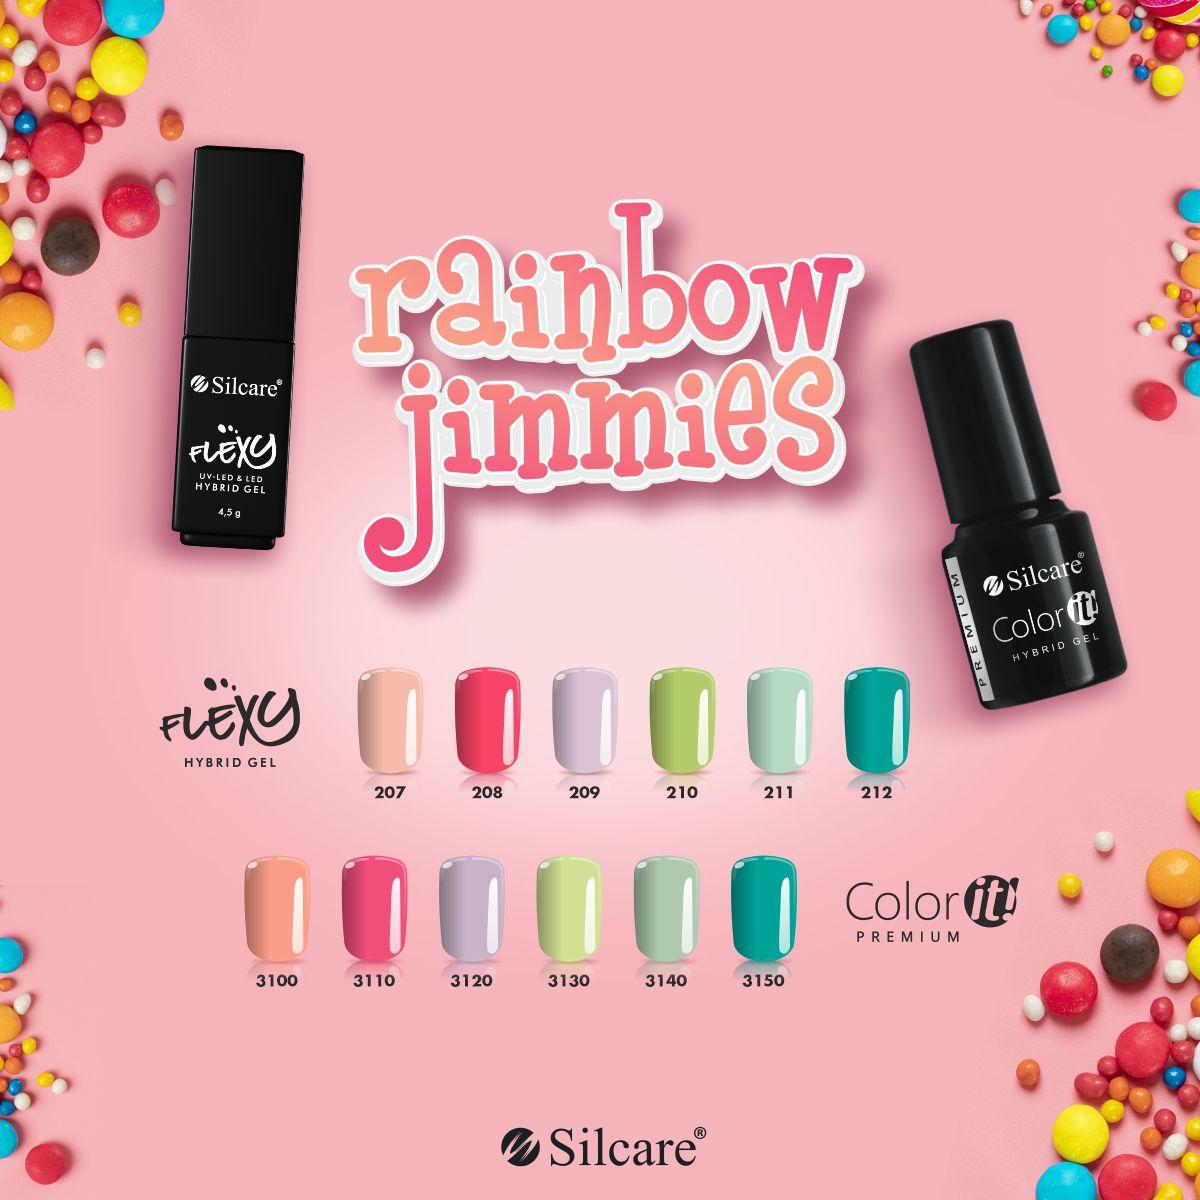 Color IT Premium Lakiery Hybrydowe - Linia Rainbow Jimmies 6 g